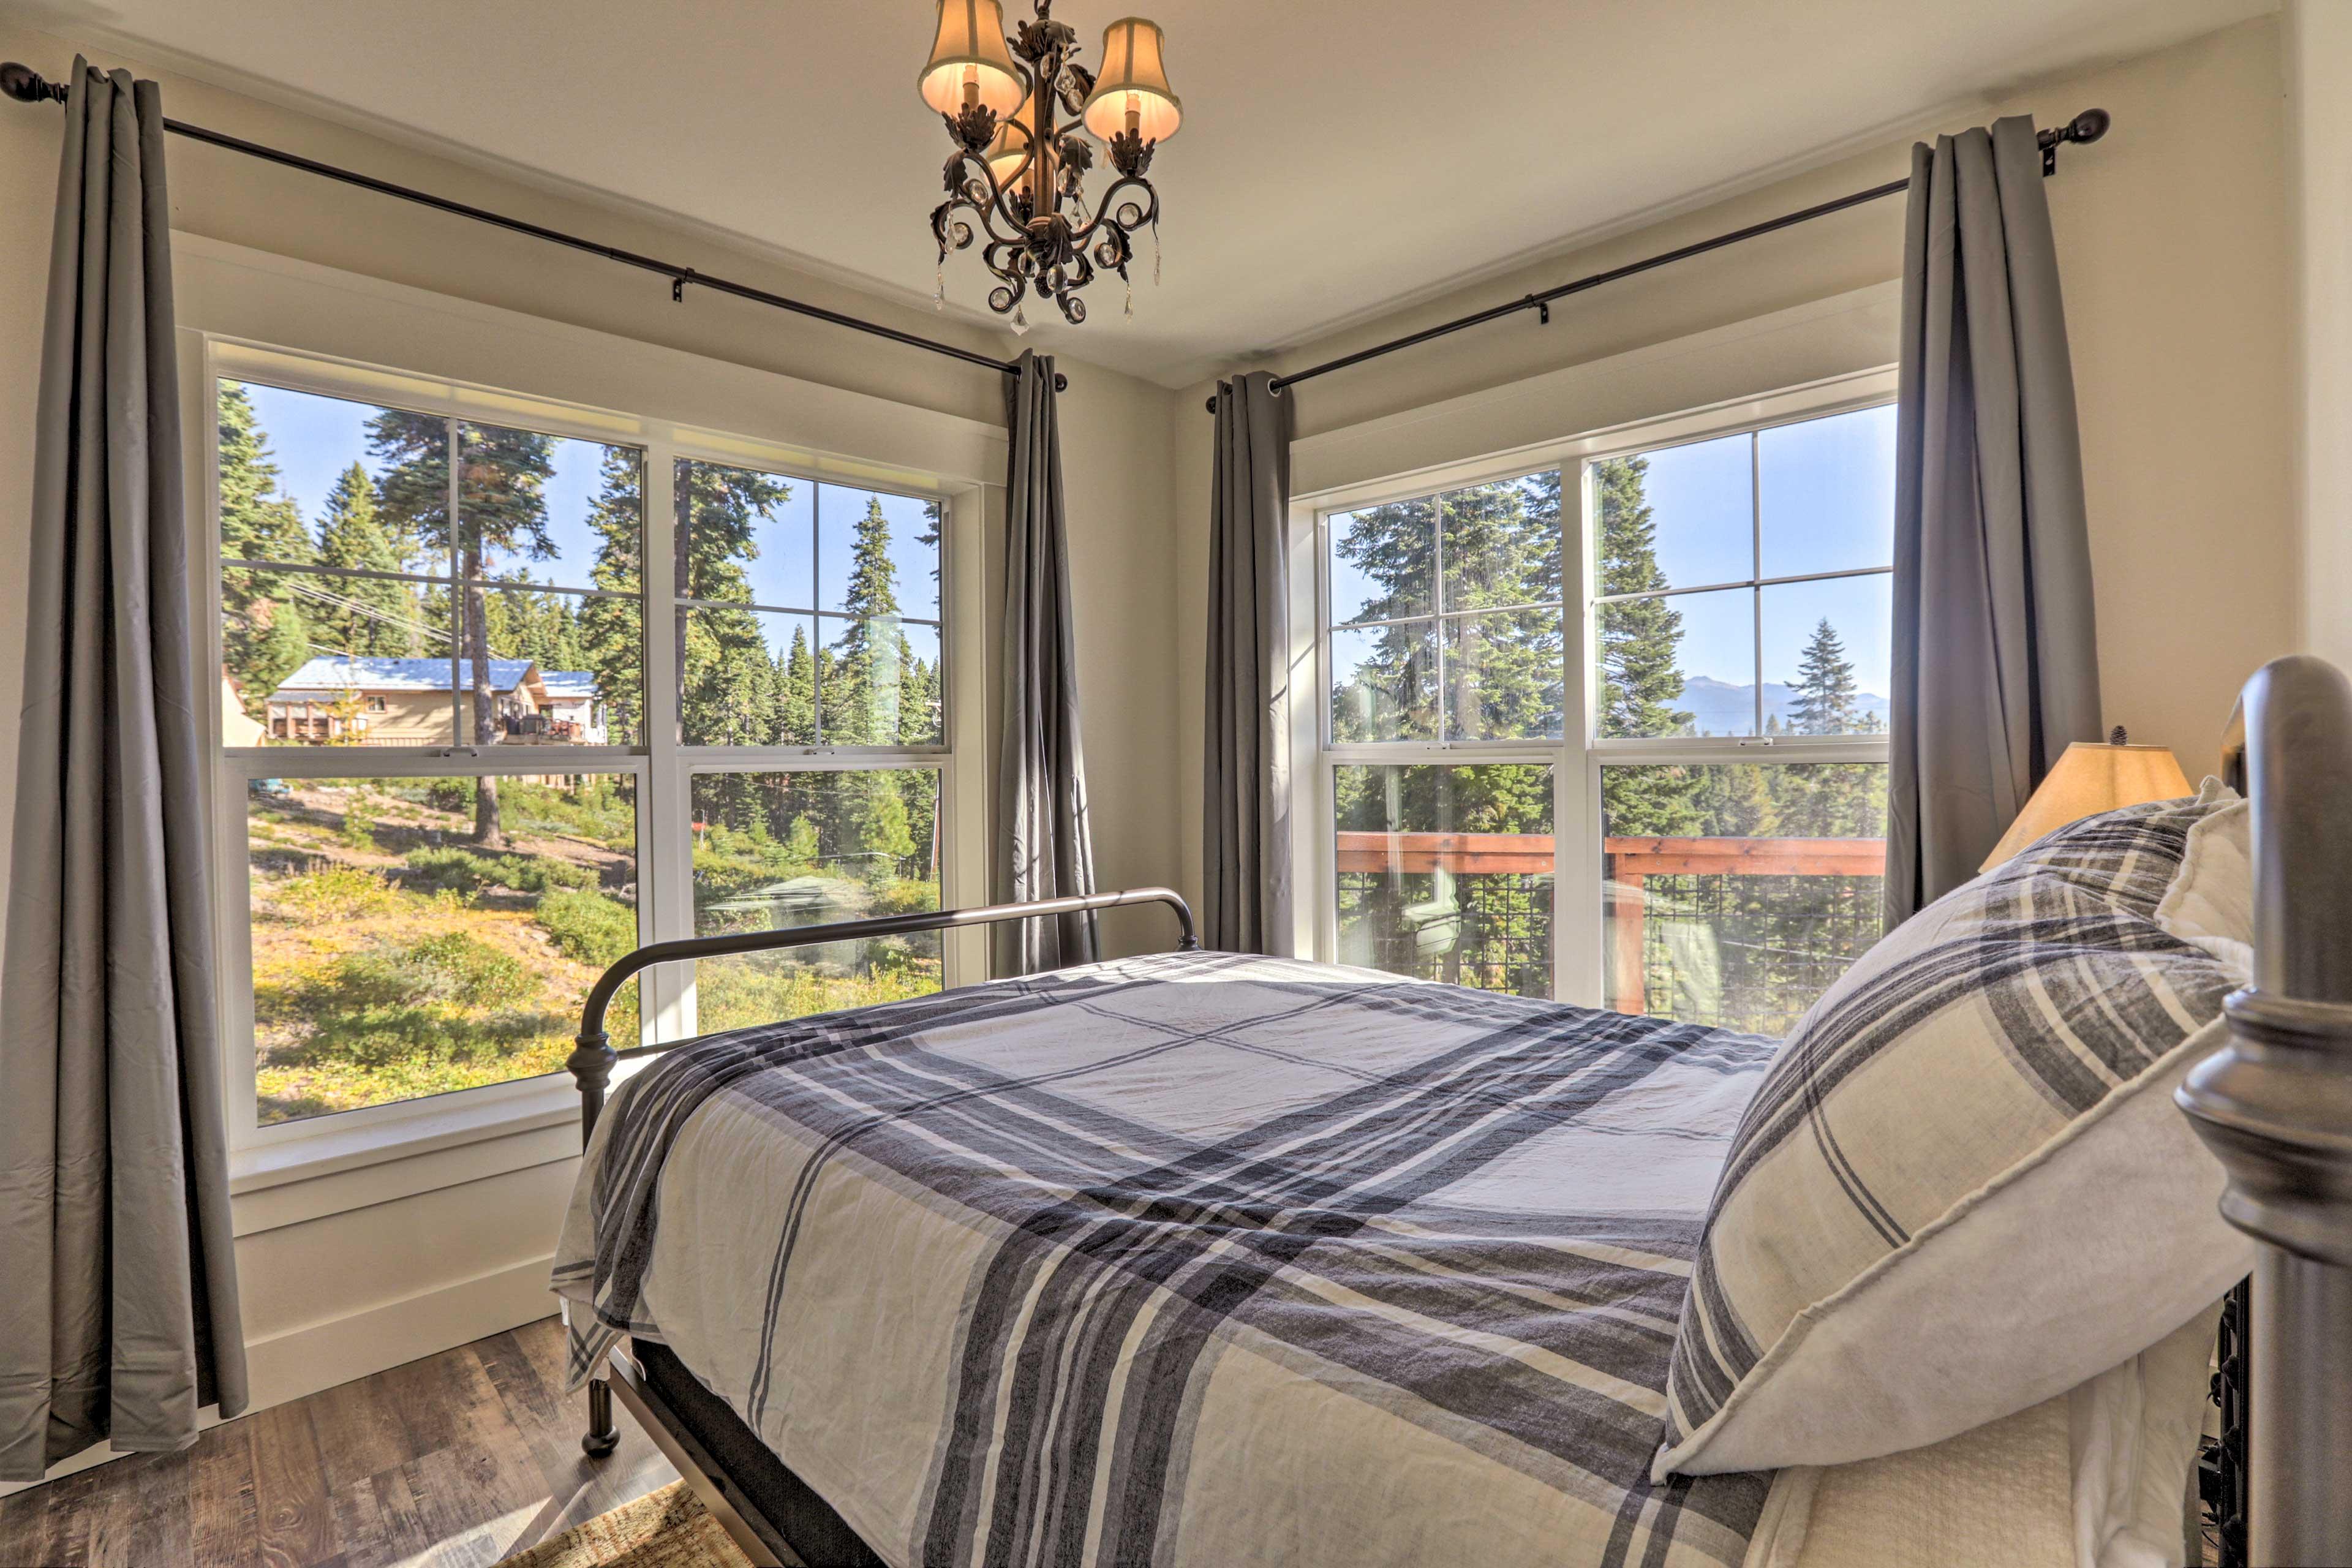 Open the windows for fresh mountain air.